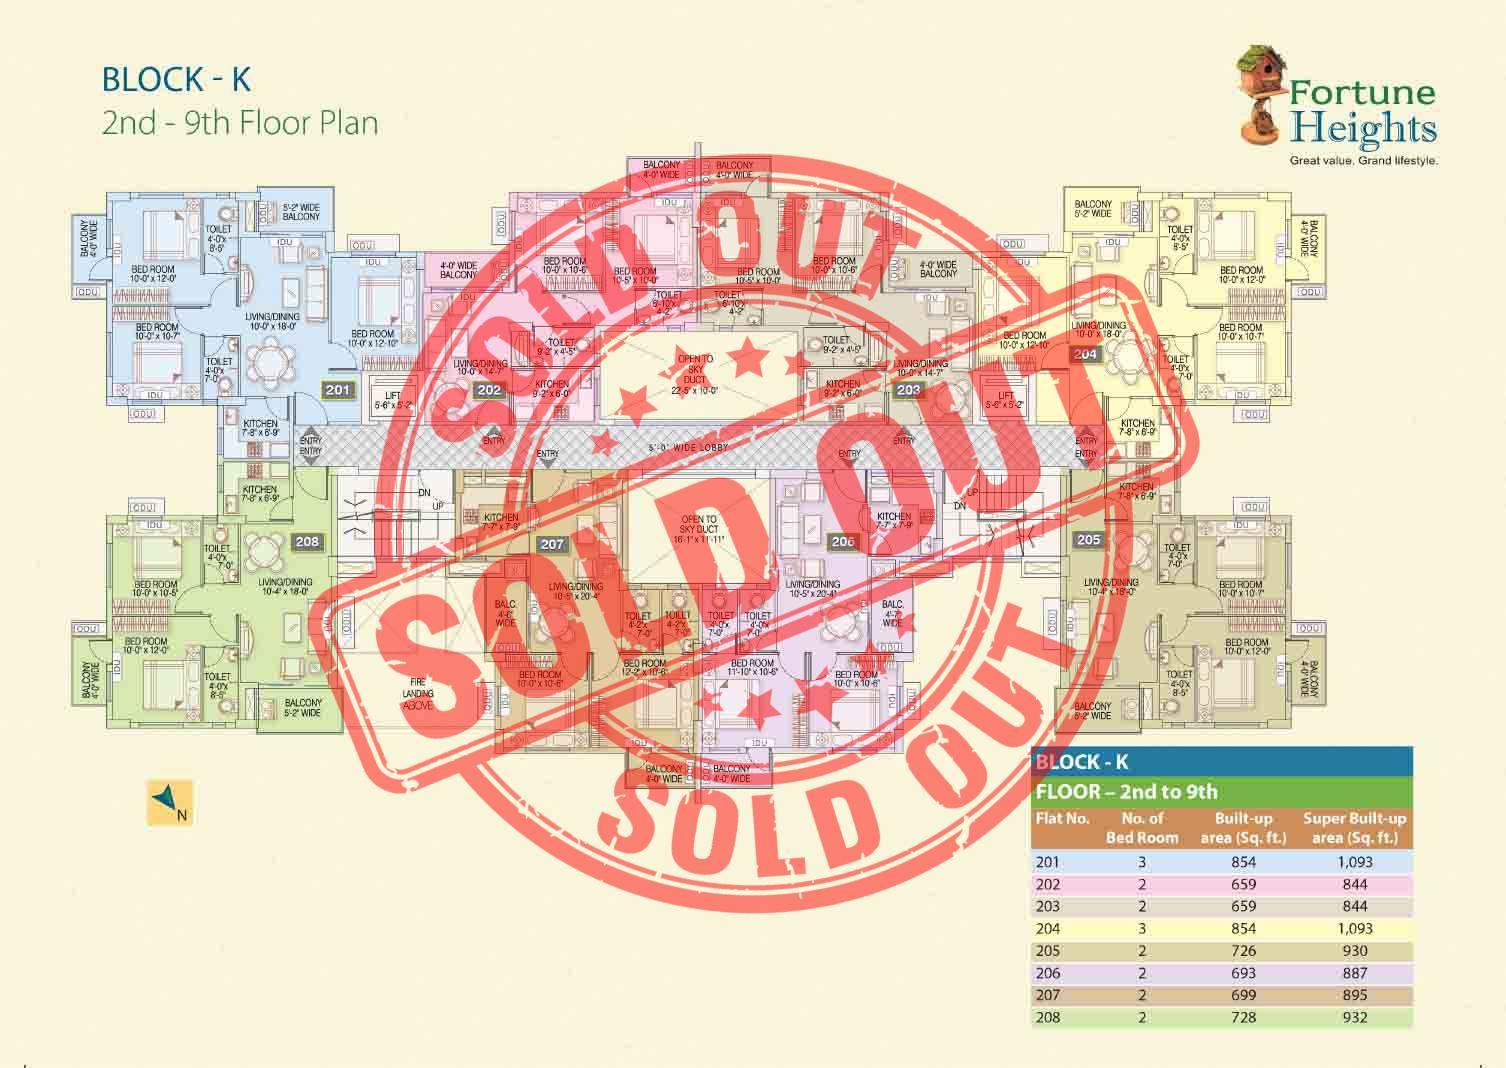 1629208009block-k-2nd-9th-floor-plan.jpg